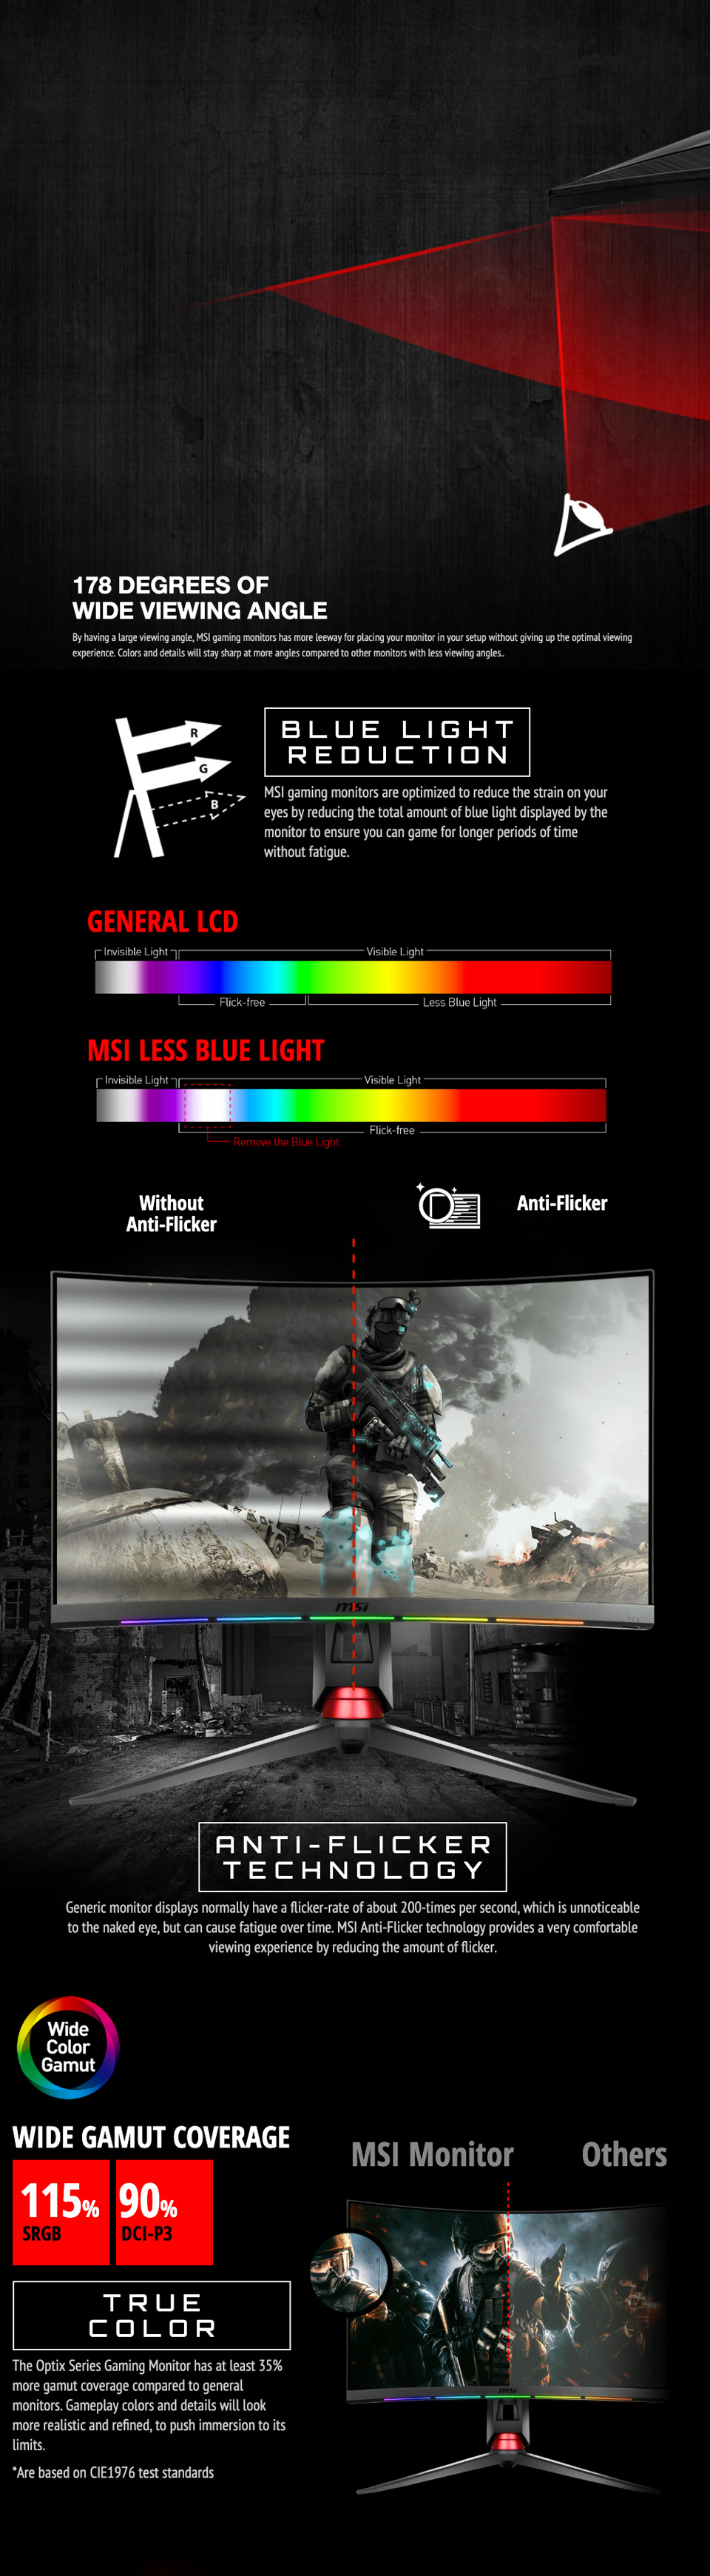 MSI Optix MPG27CQ2 QHD 144Hz Curved RGB 27in VA Gaming Monitor features 4